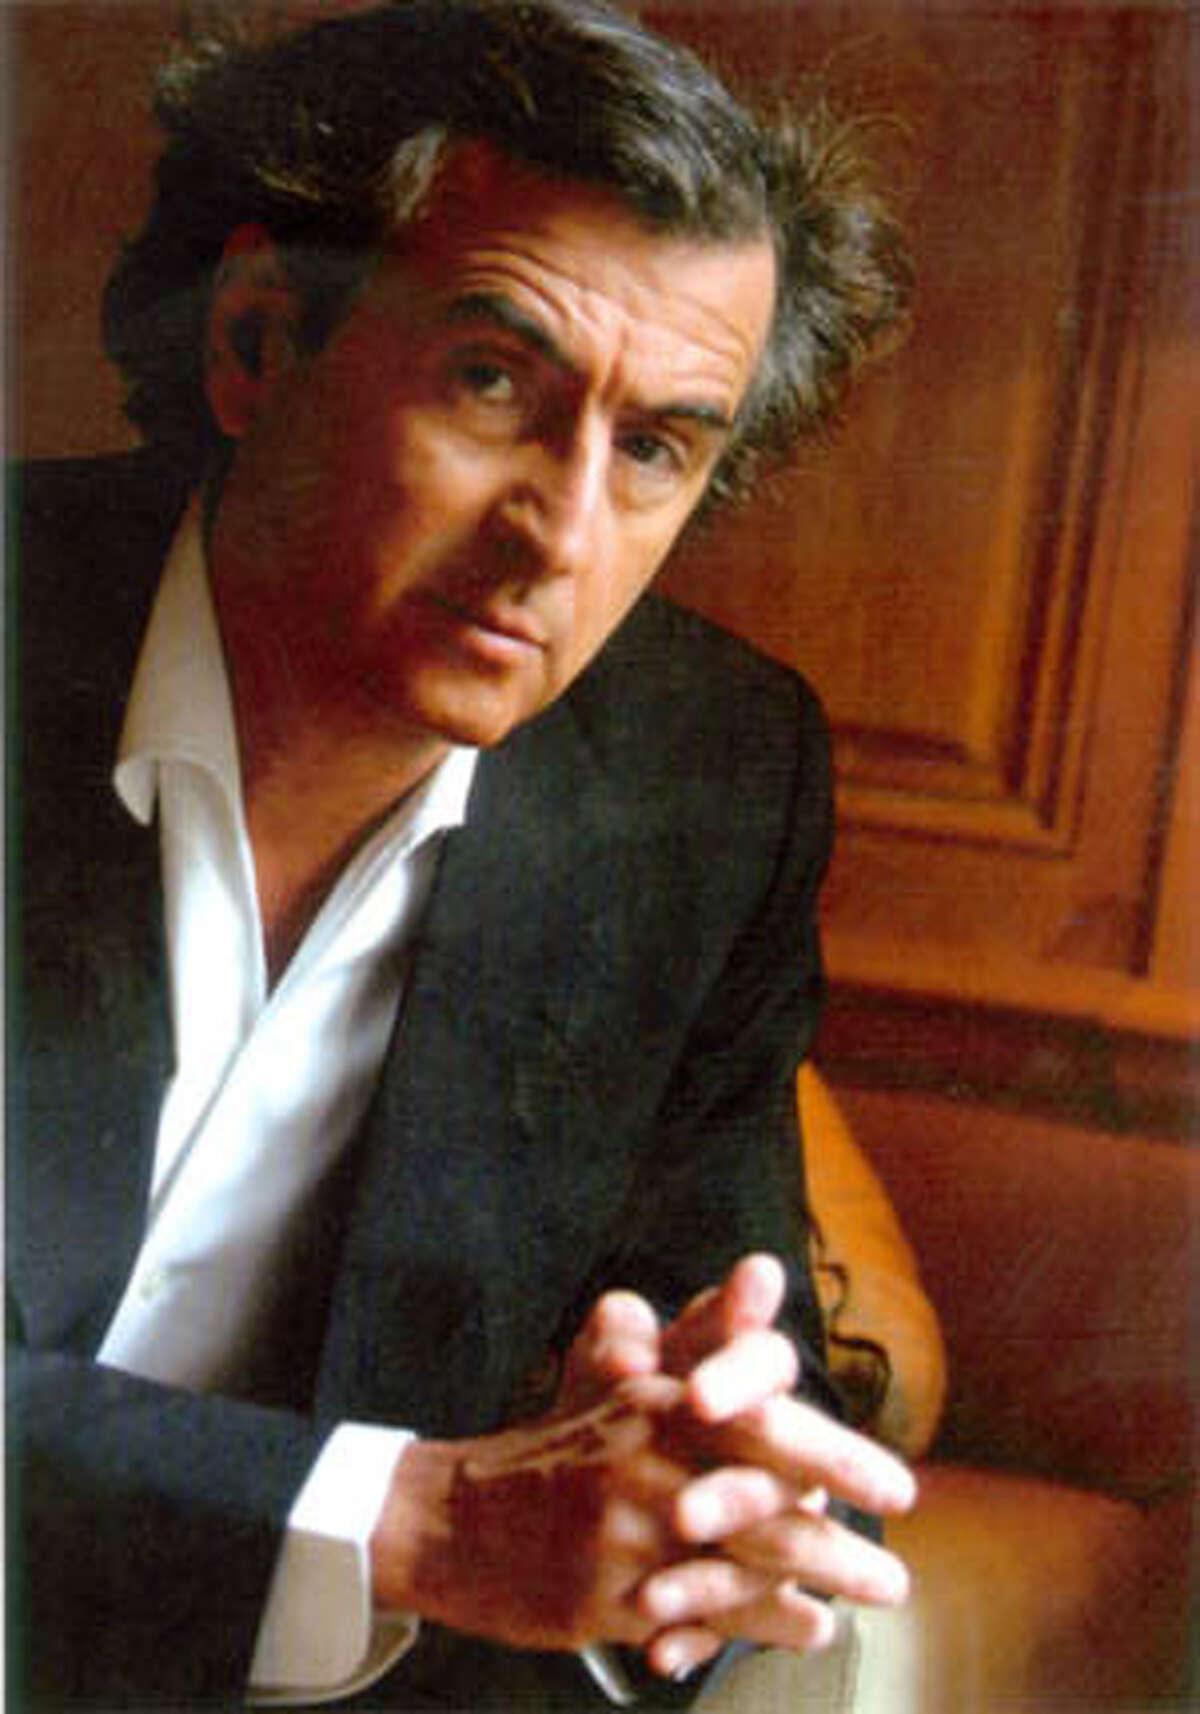 Bernard Henri-Levy, author of